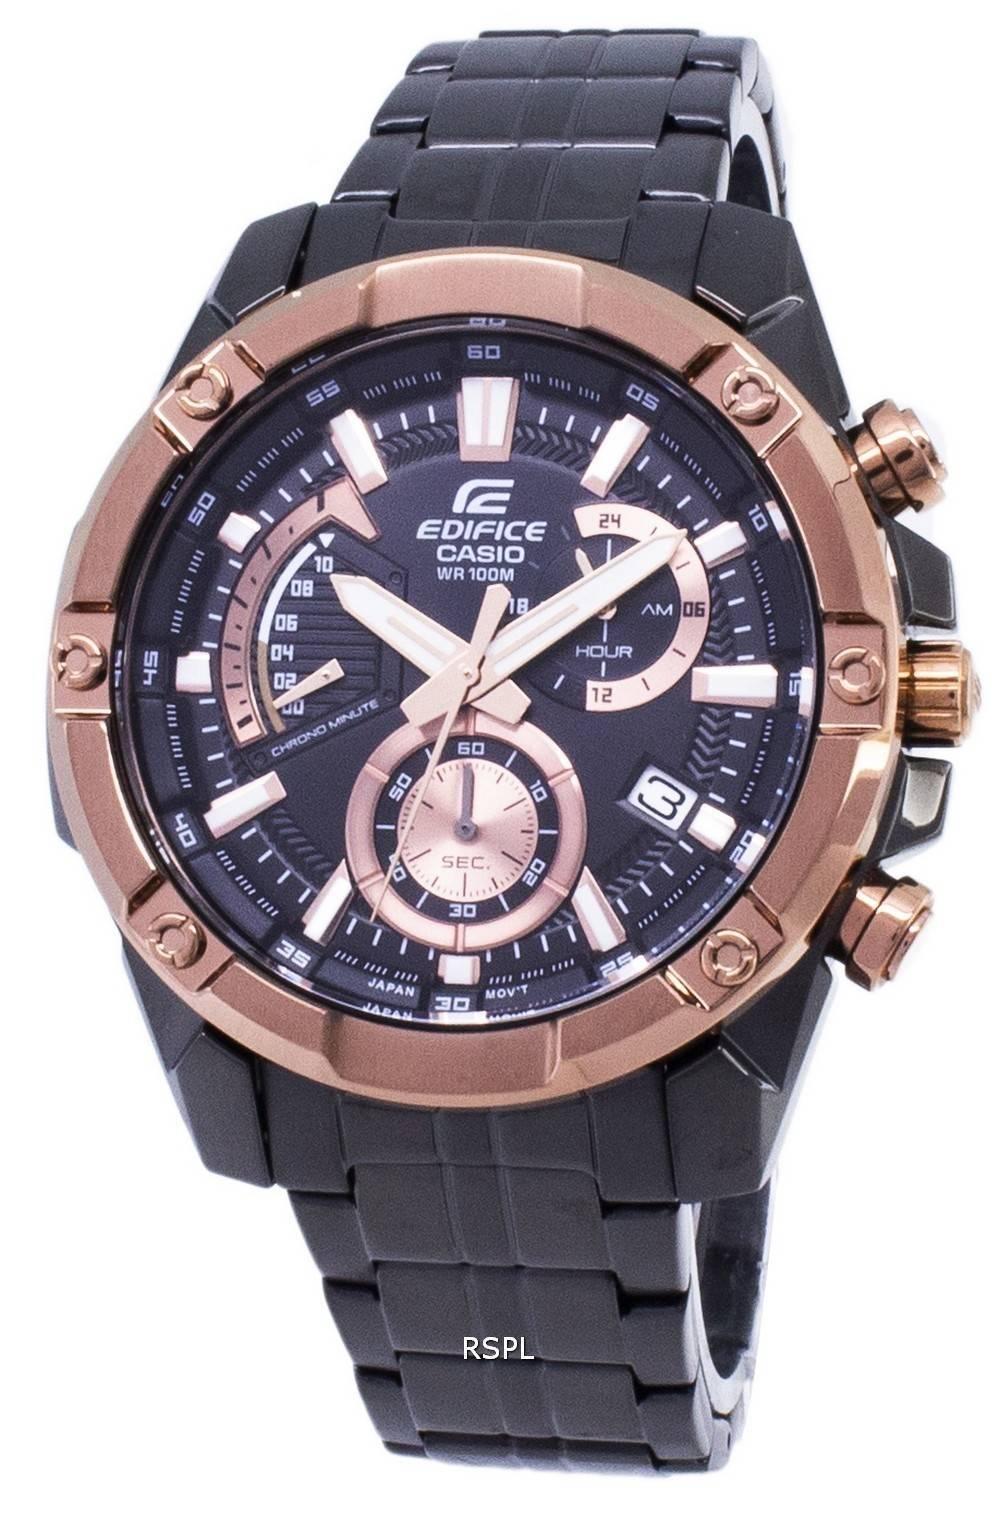 Casio Edifice EFR-559DC-1BV EFR559DC-1BV Chronograph Analog Men's Watch